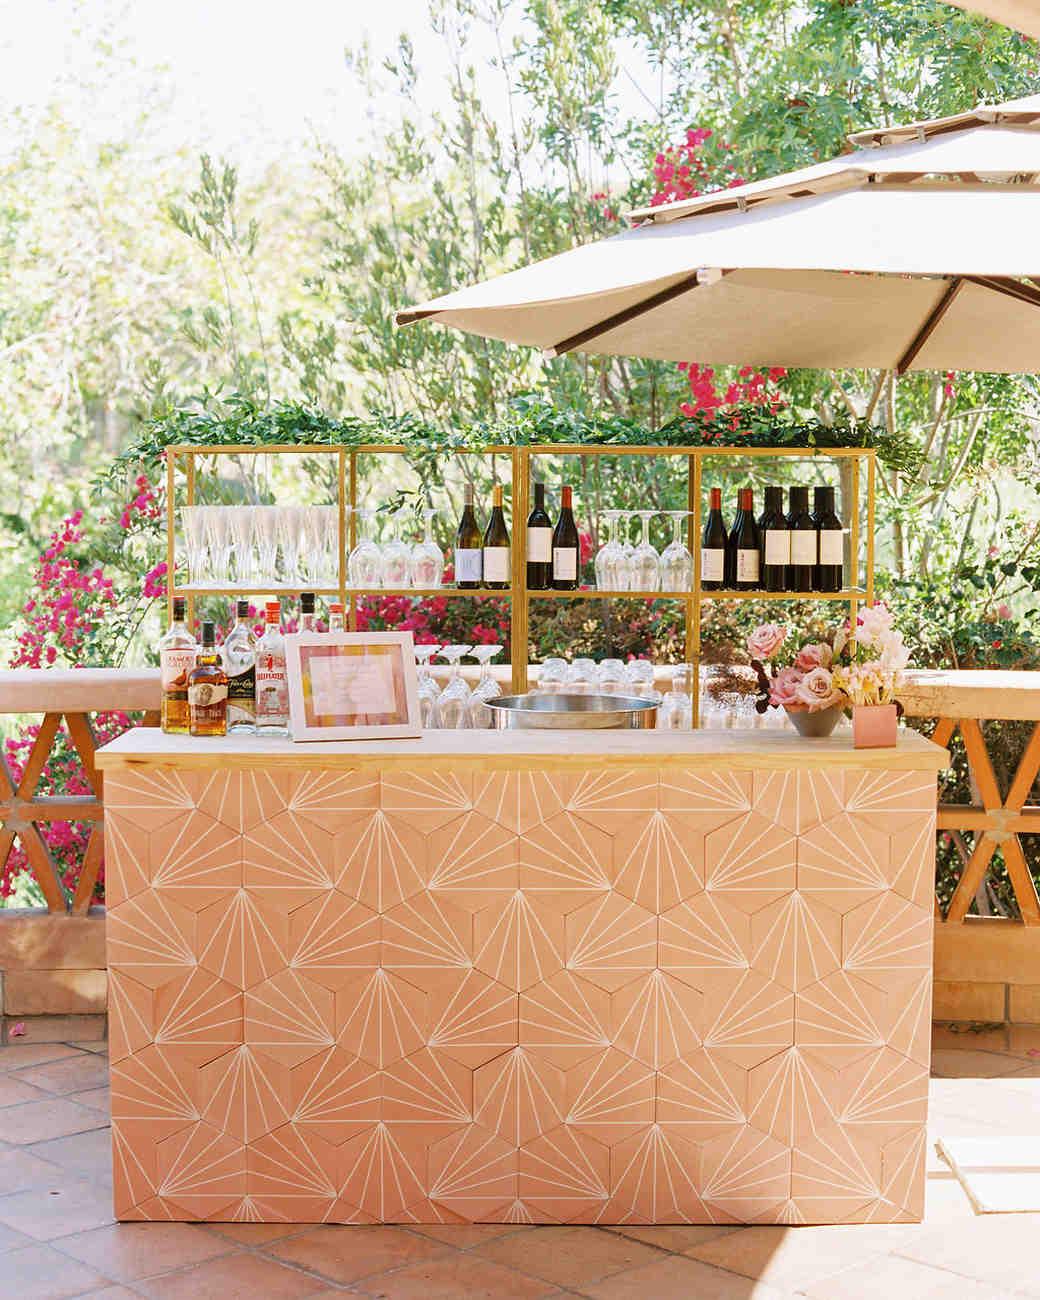 paige zack wedding bar with umbrella